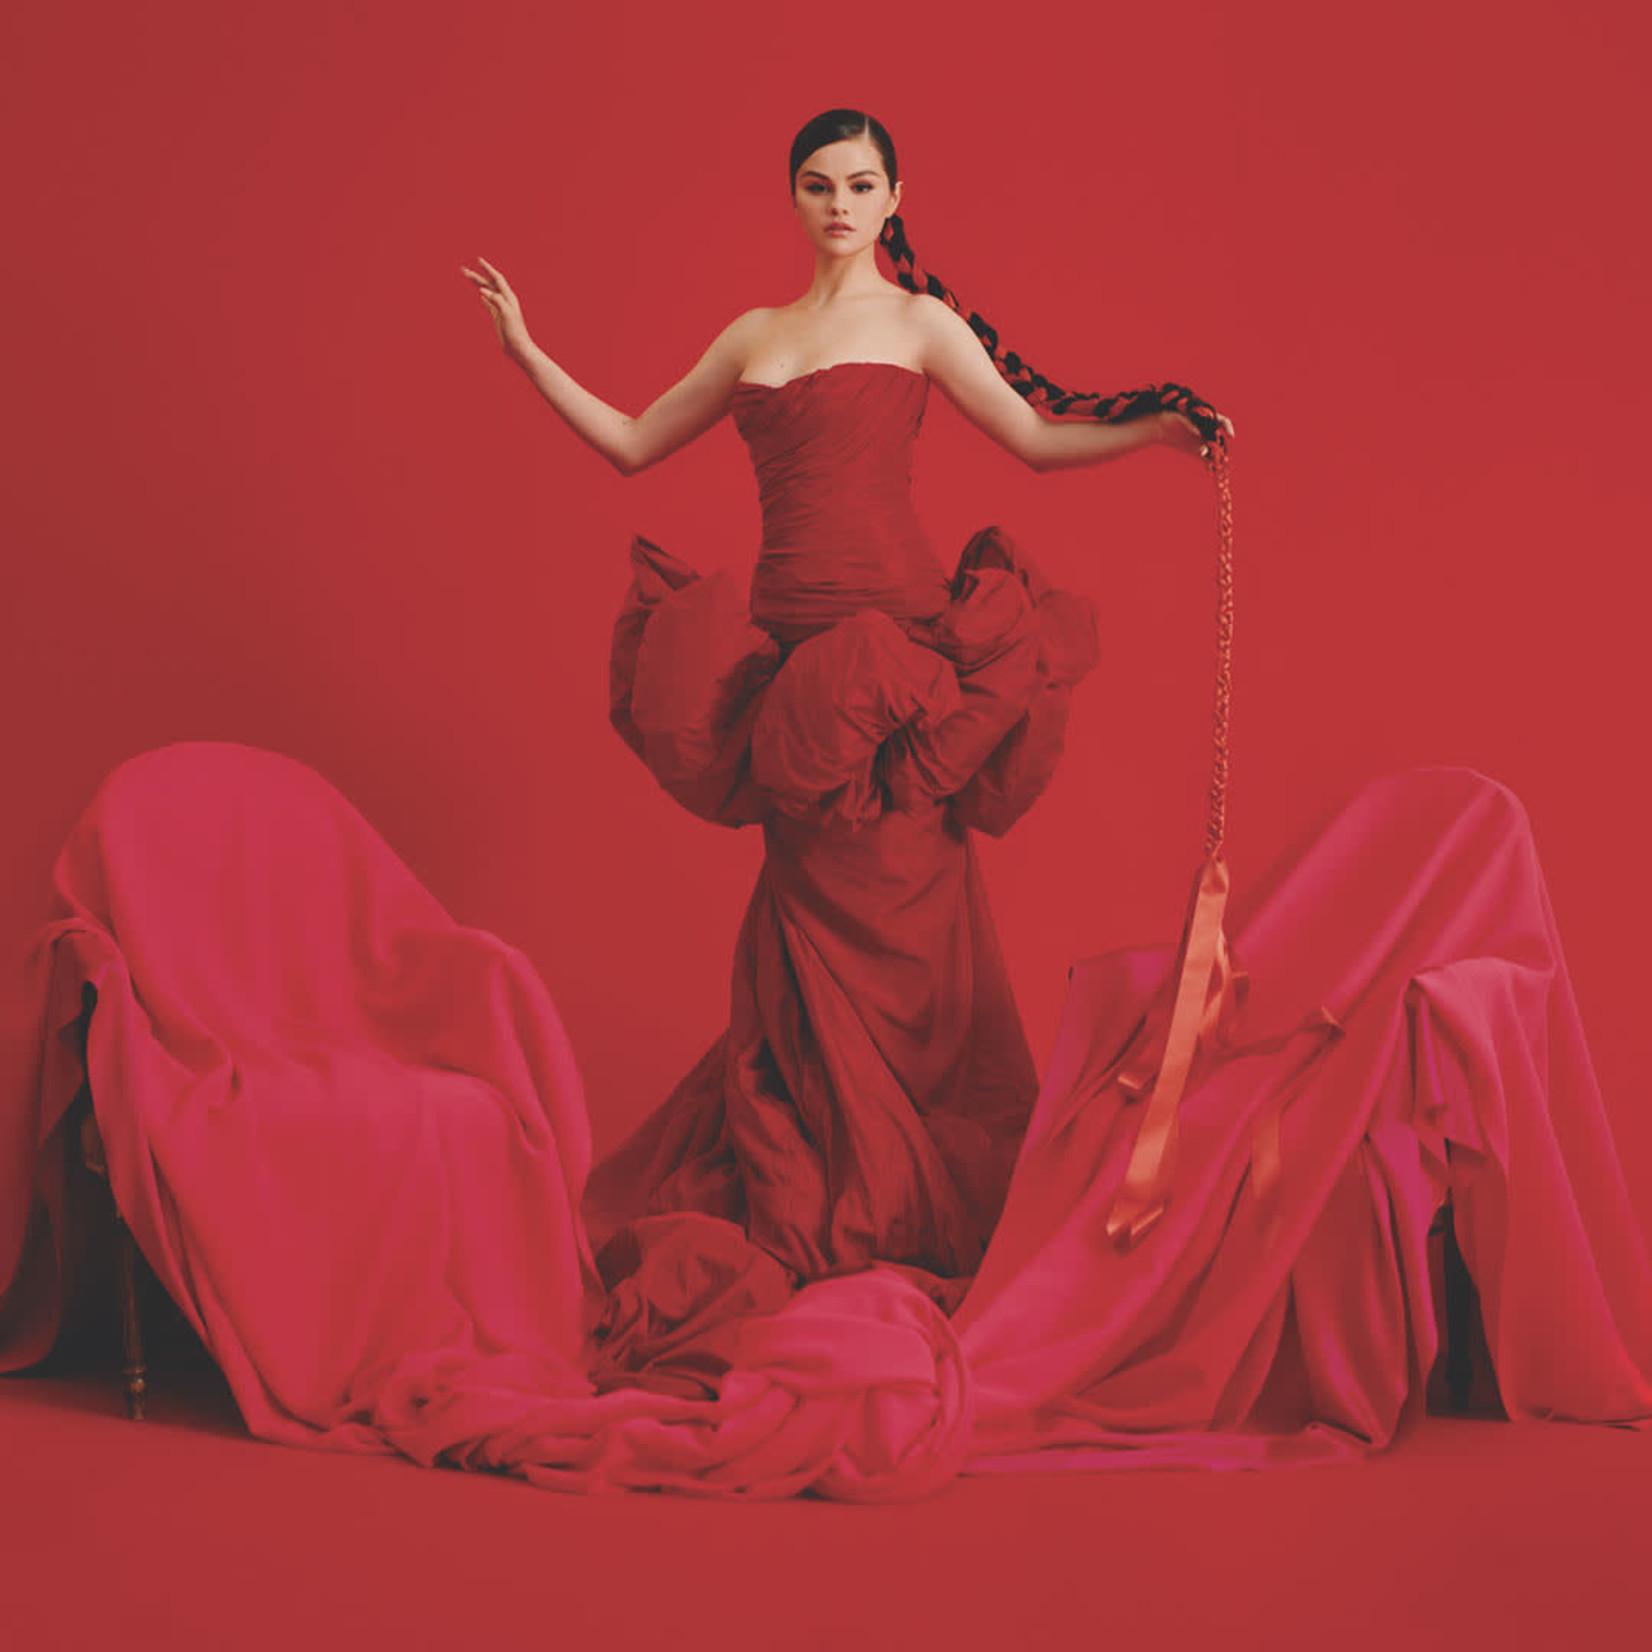 [New] Gomez, Selena: Revelacion (colour vinyl)